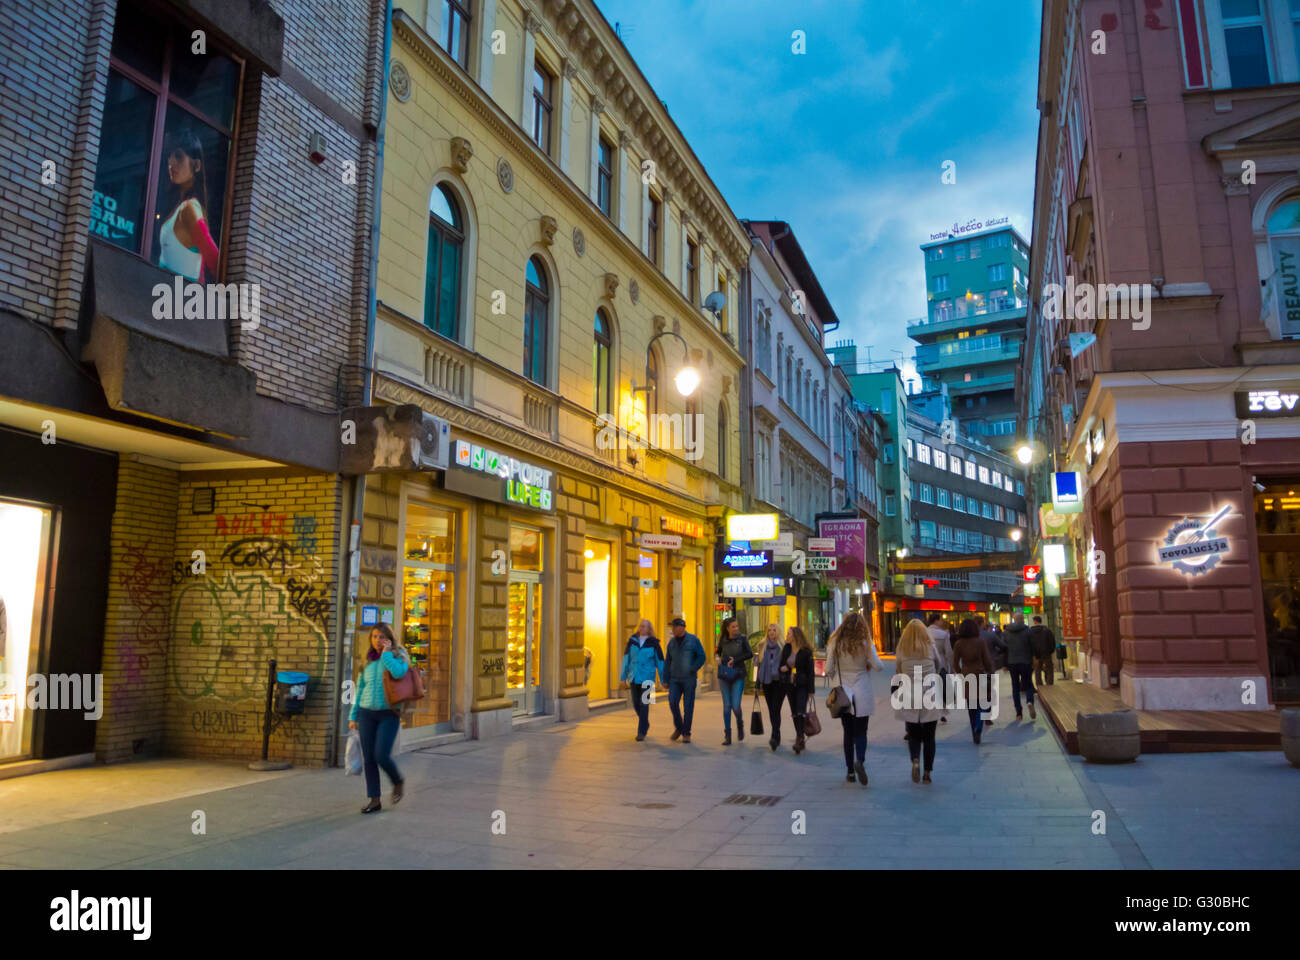 Sarajevo Town Stockfotos & Sarajevo Town Bilder - Alamy